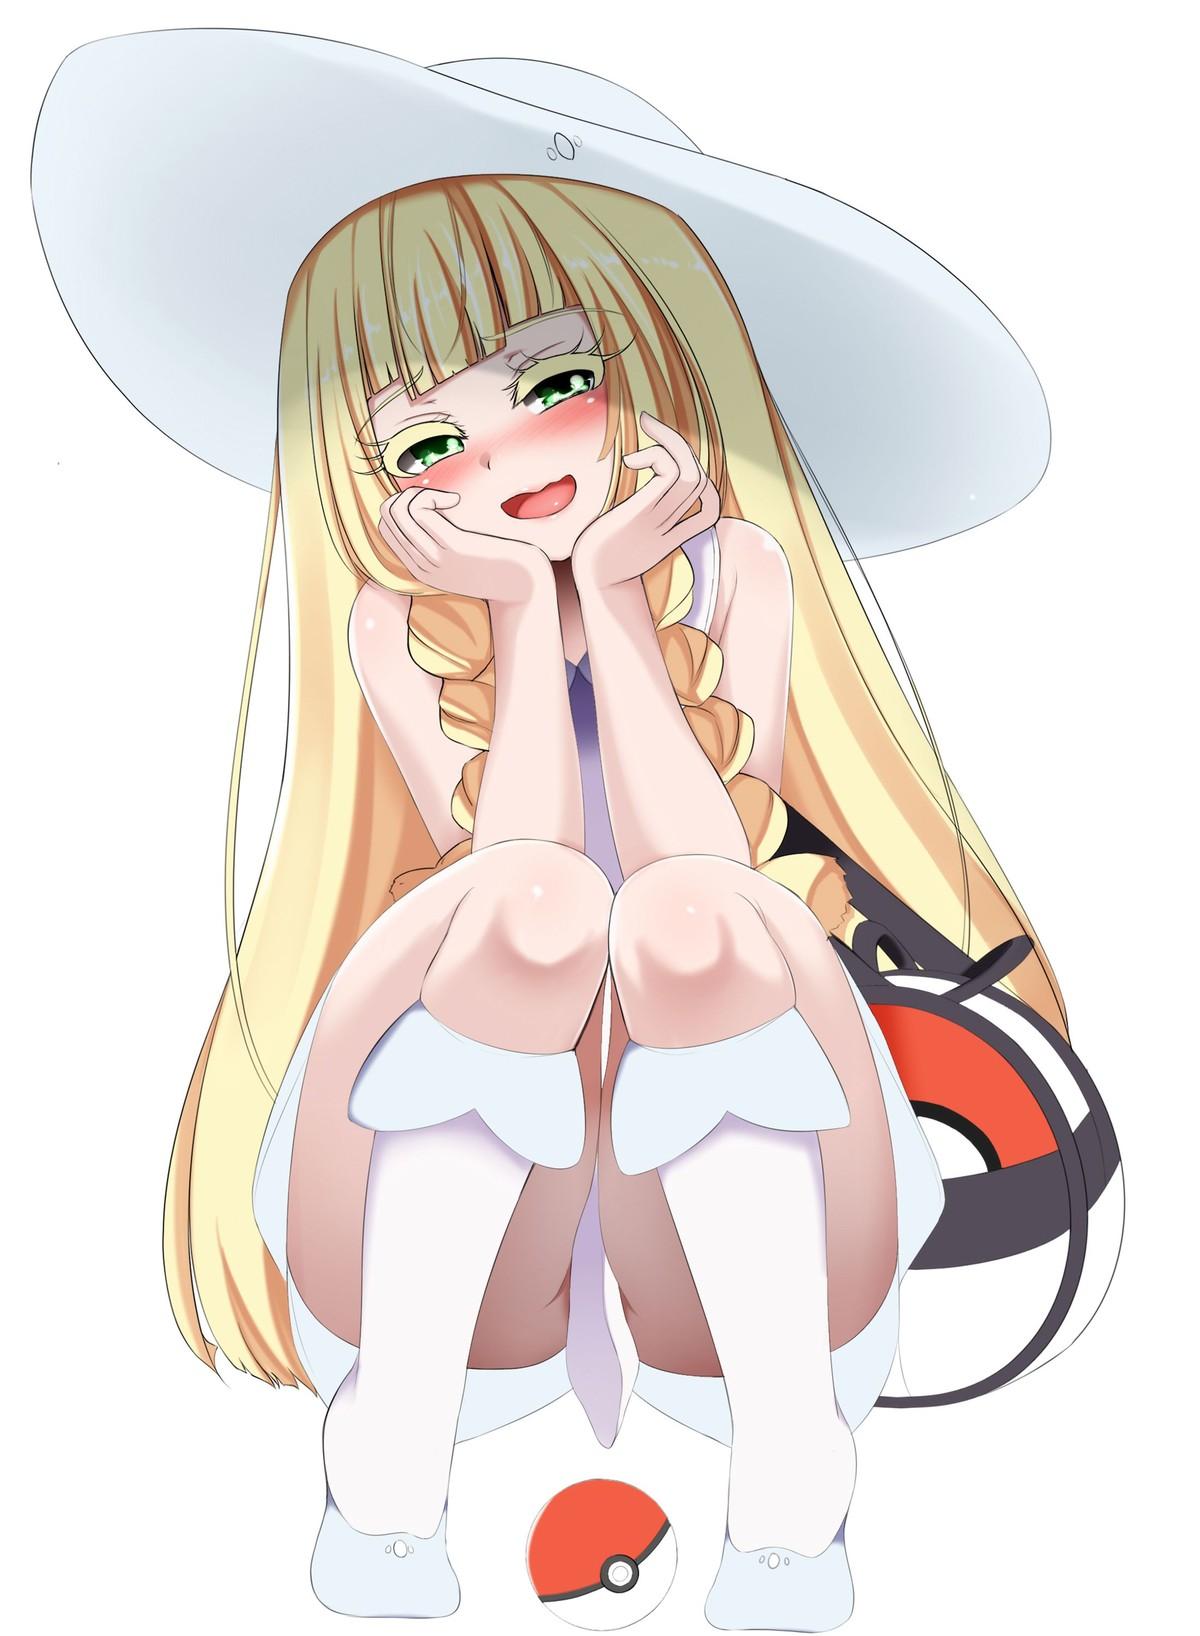 lillie_(pokemon)066